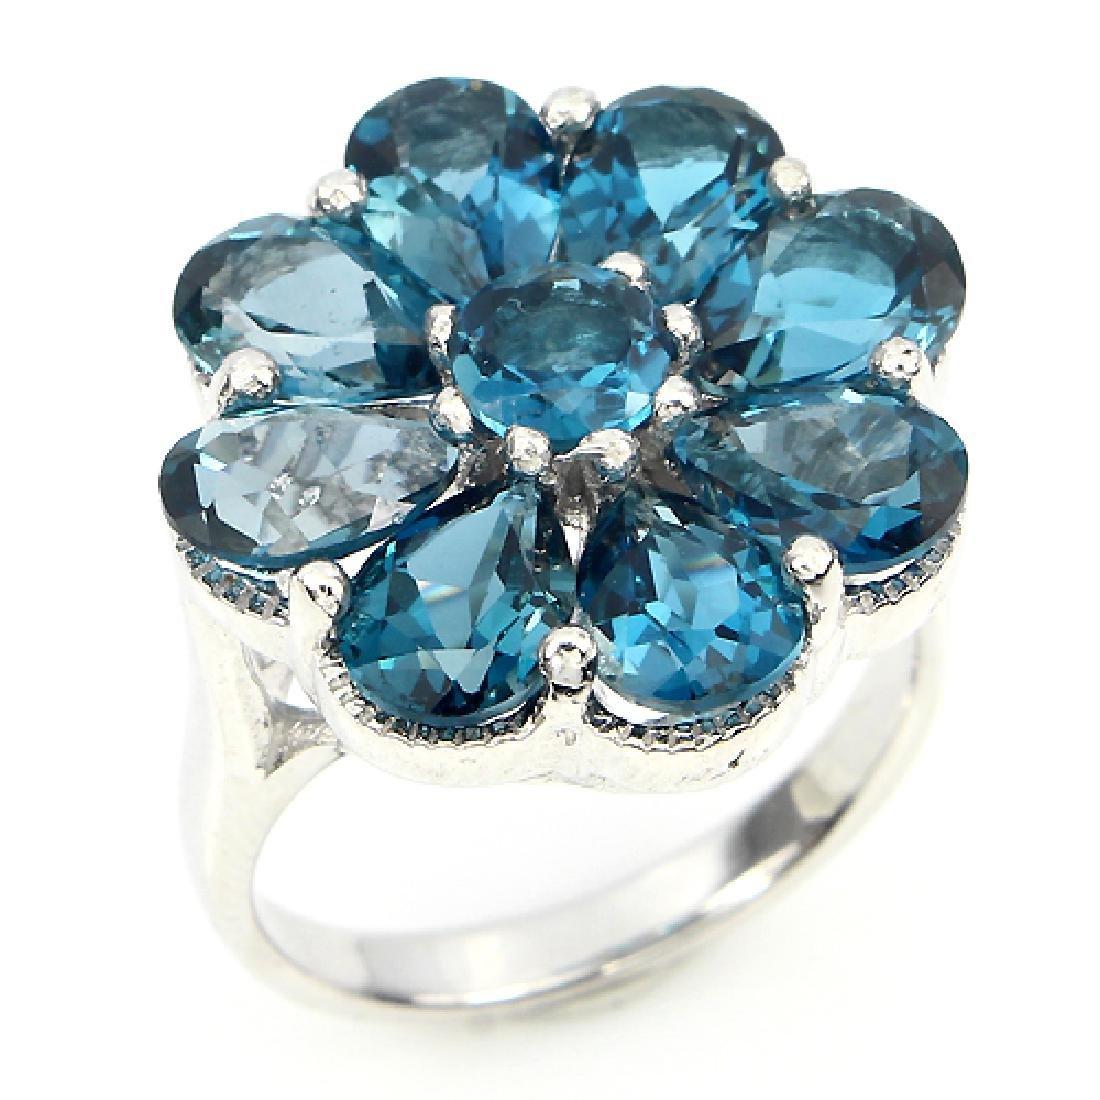 Natural London Blue Topaz Ring - 2